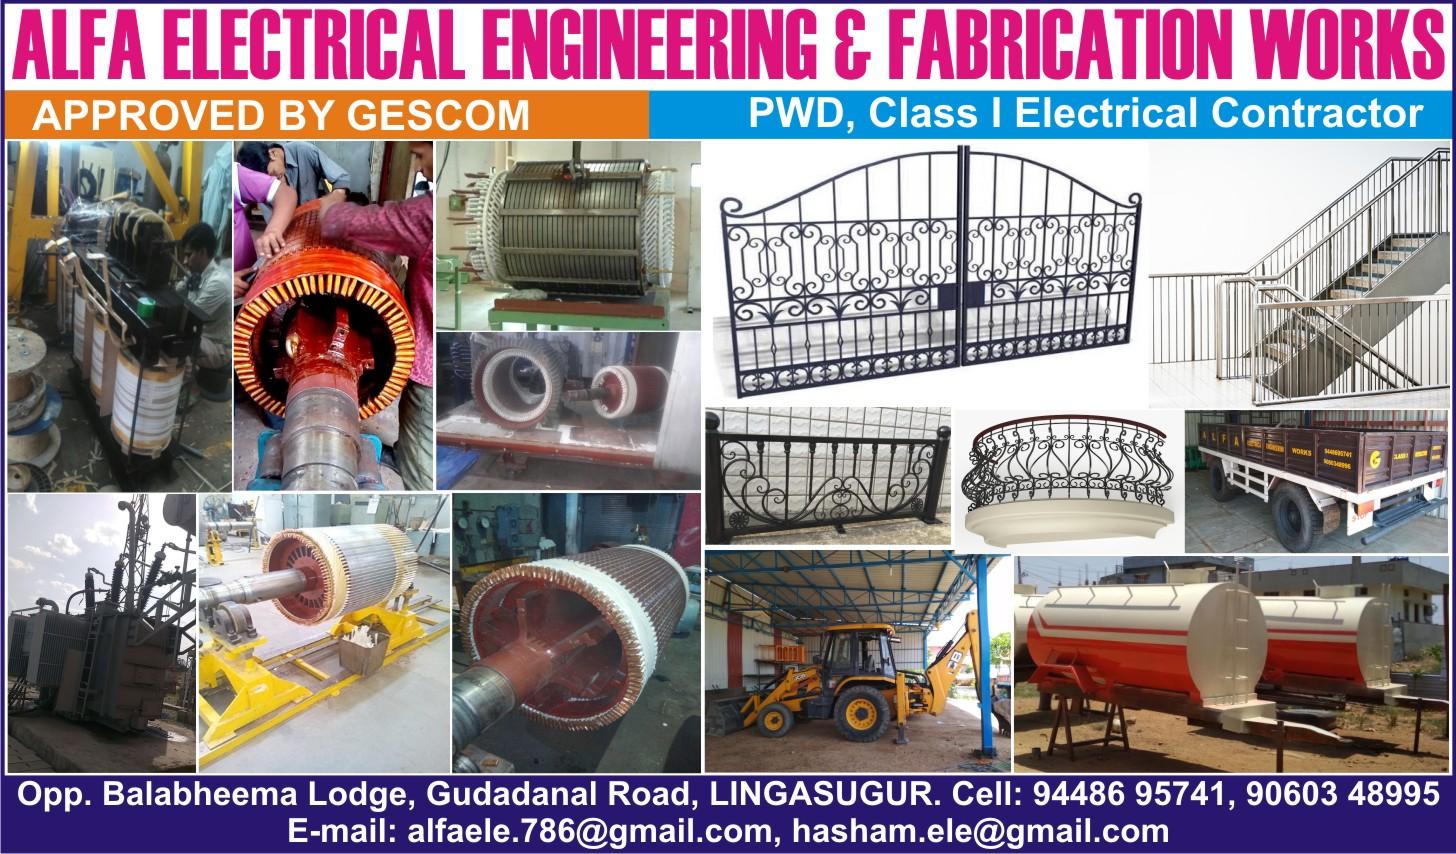 Alfa Electrical Engineering & Fabrication Works